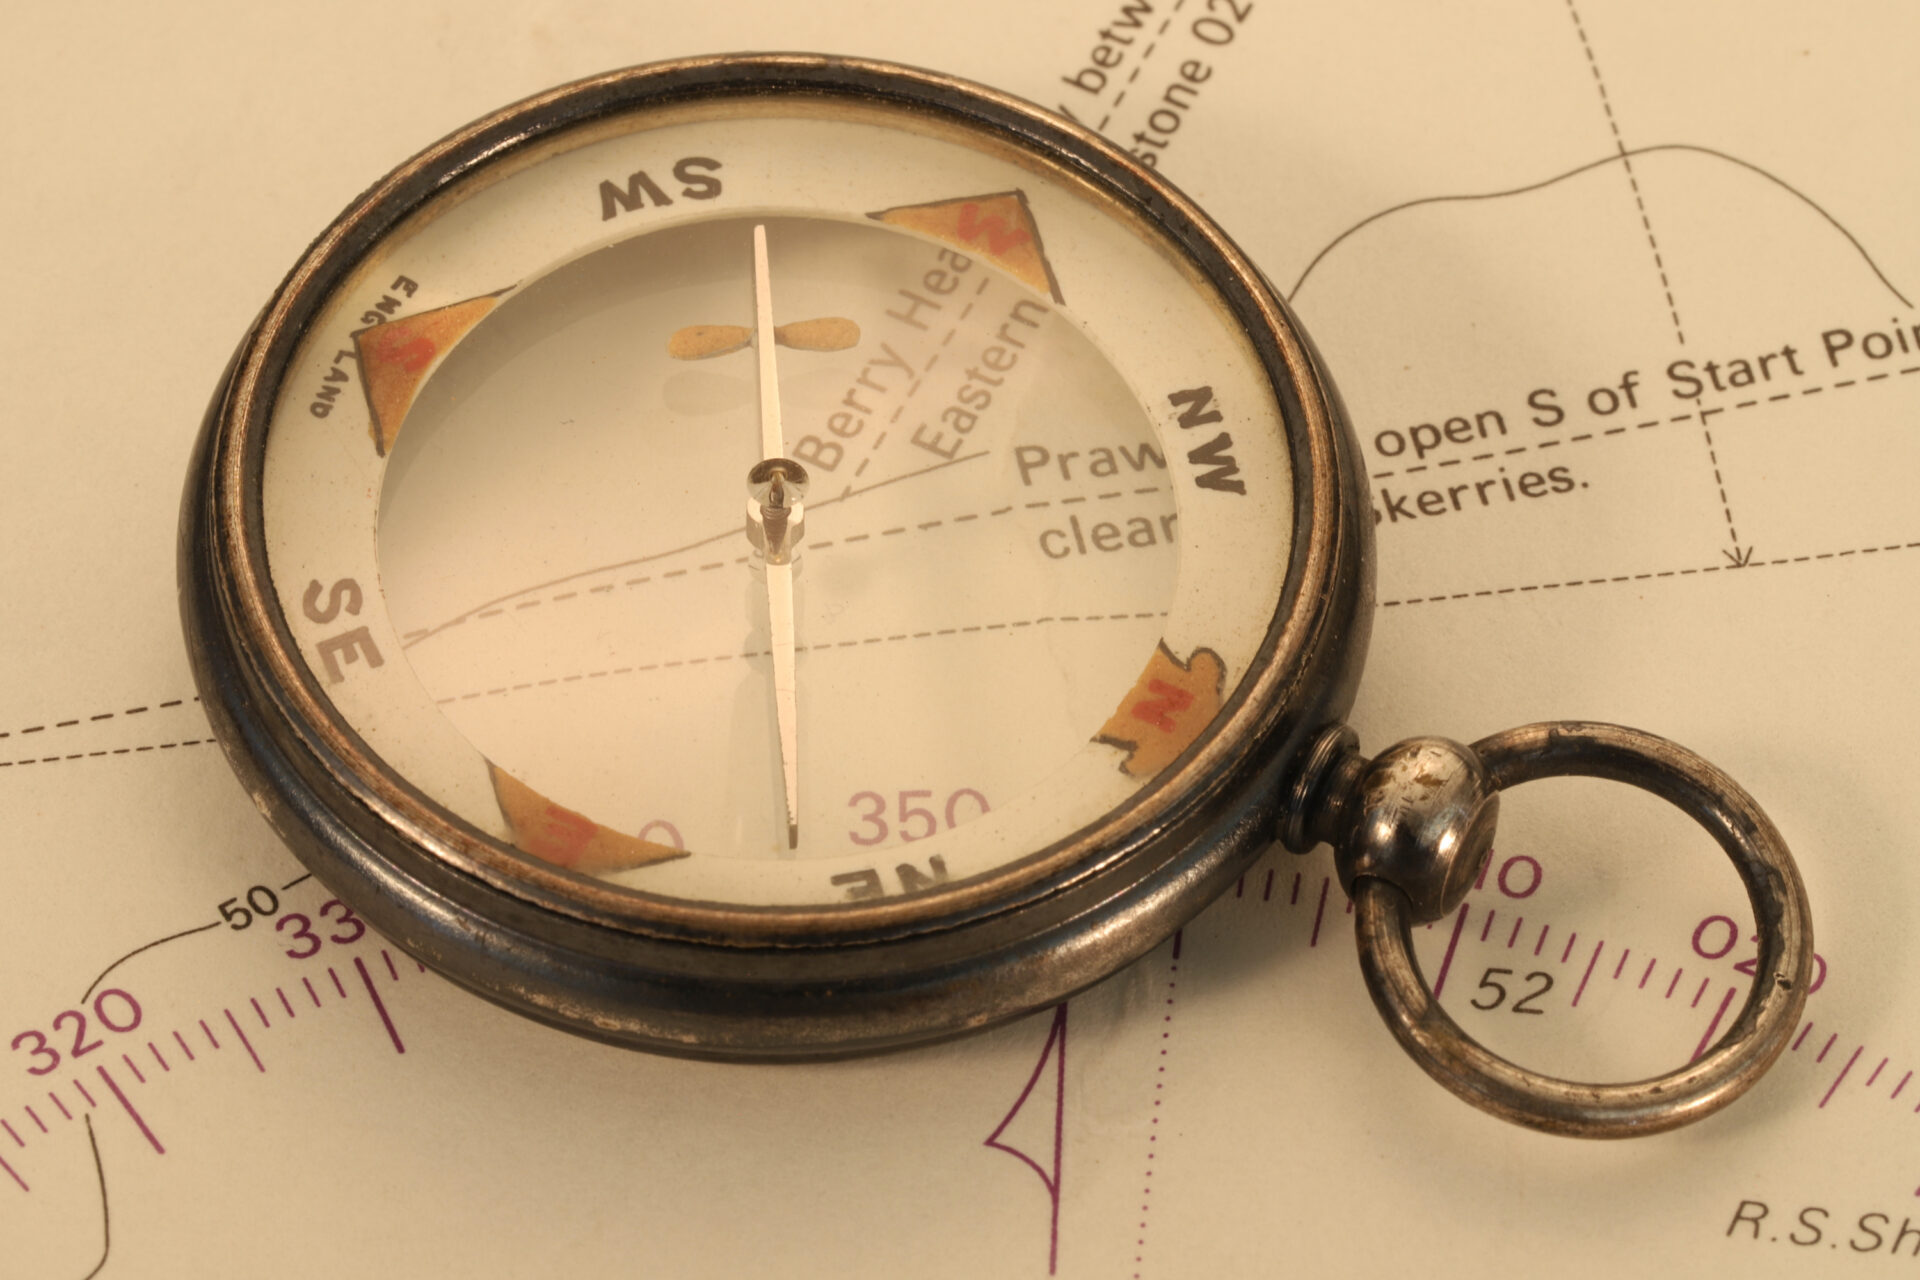 Image of Barker Radiant Transparent Pebble Lens Compass c1910 showing magnifying effect